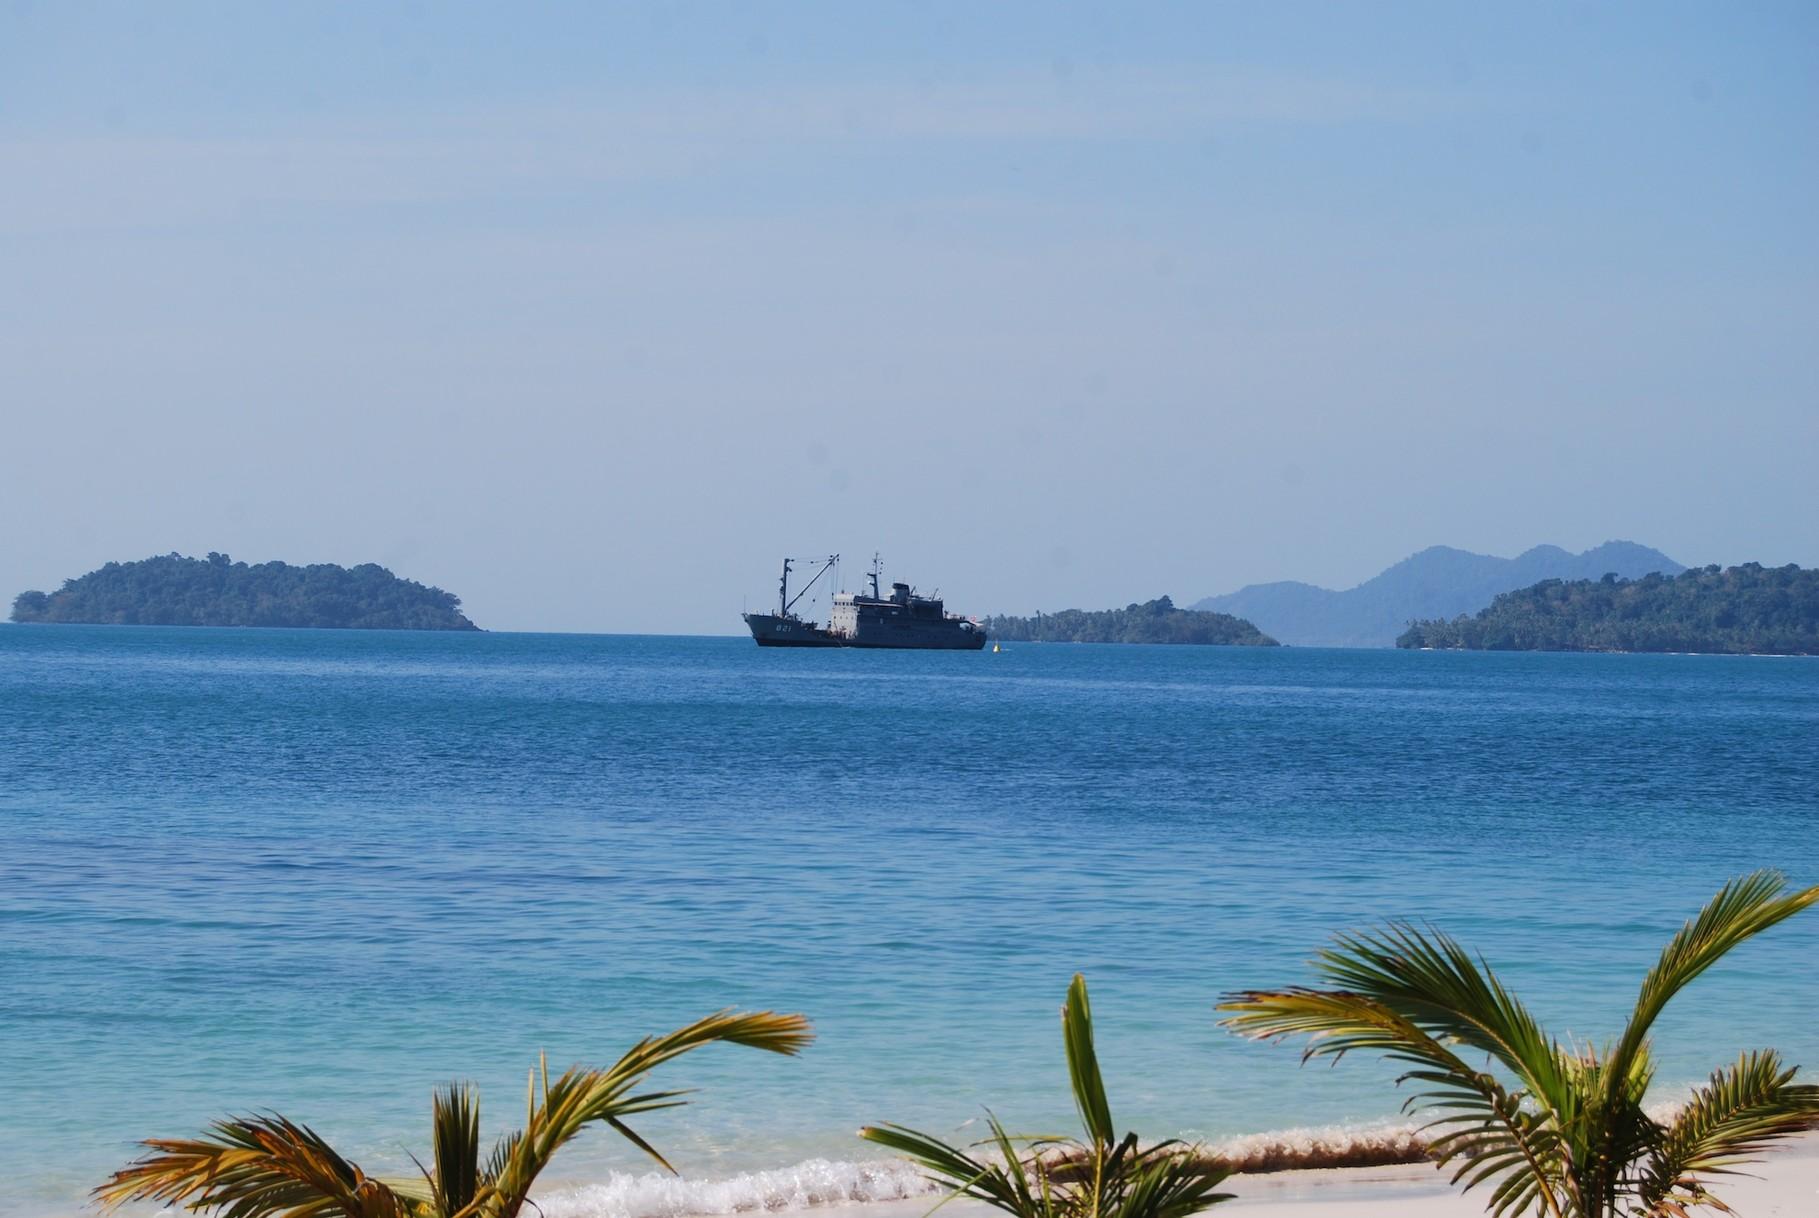 Militärschiff beim Bojen setzen